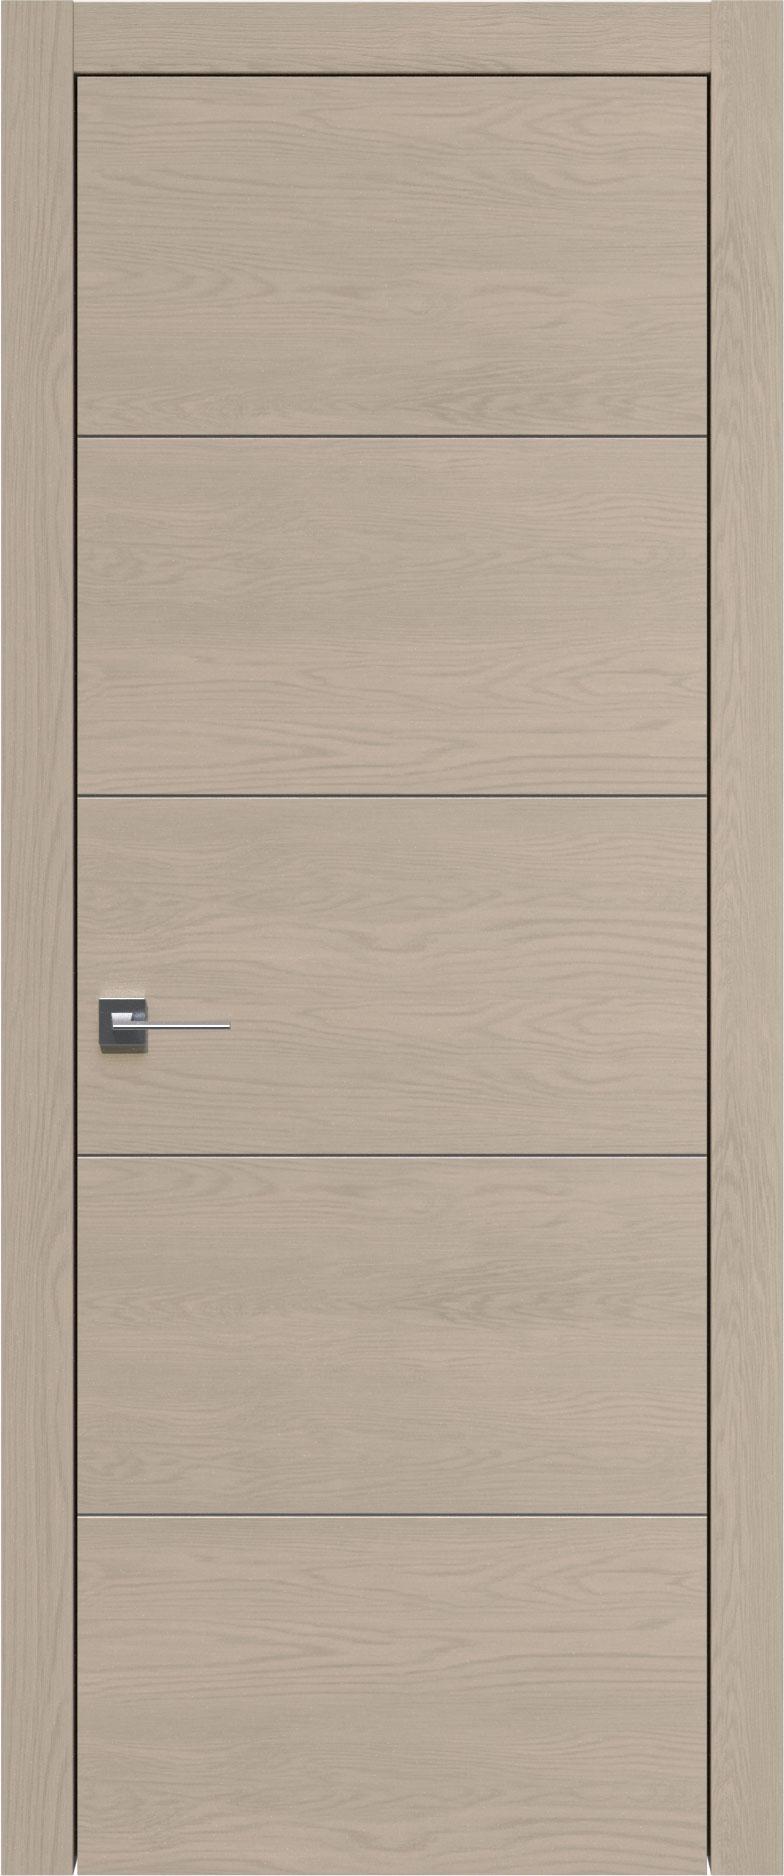 Tivoli Д-3 цвет - Дуб муар Без стекла (ДГ)